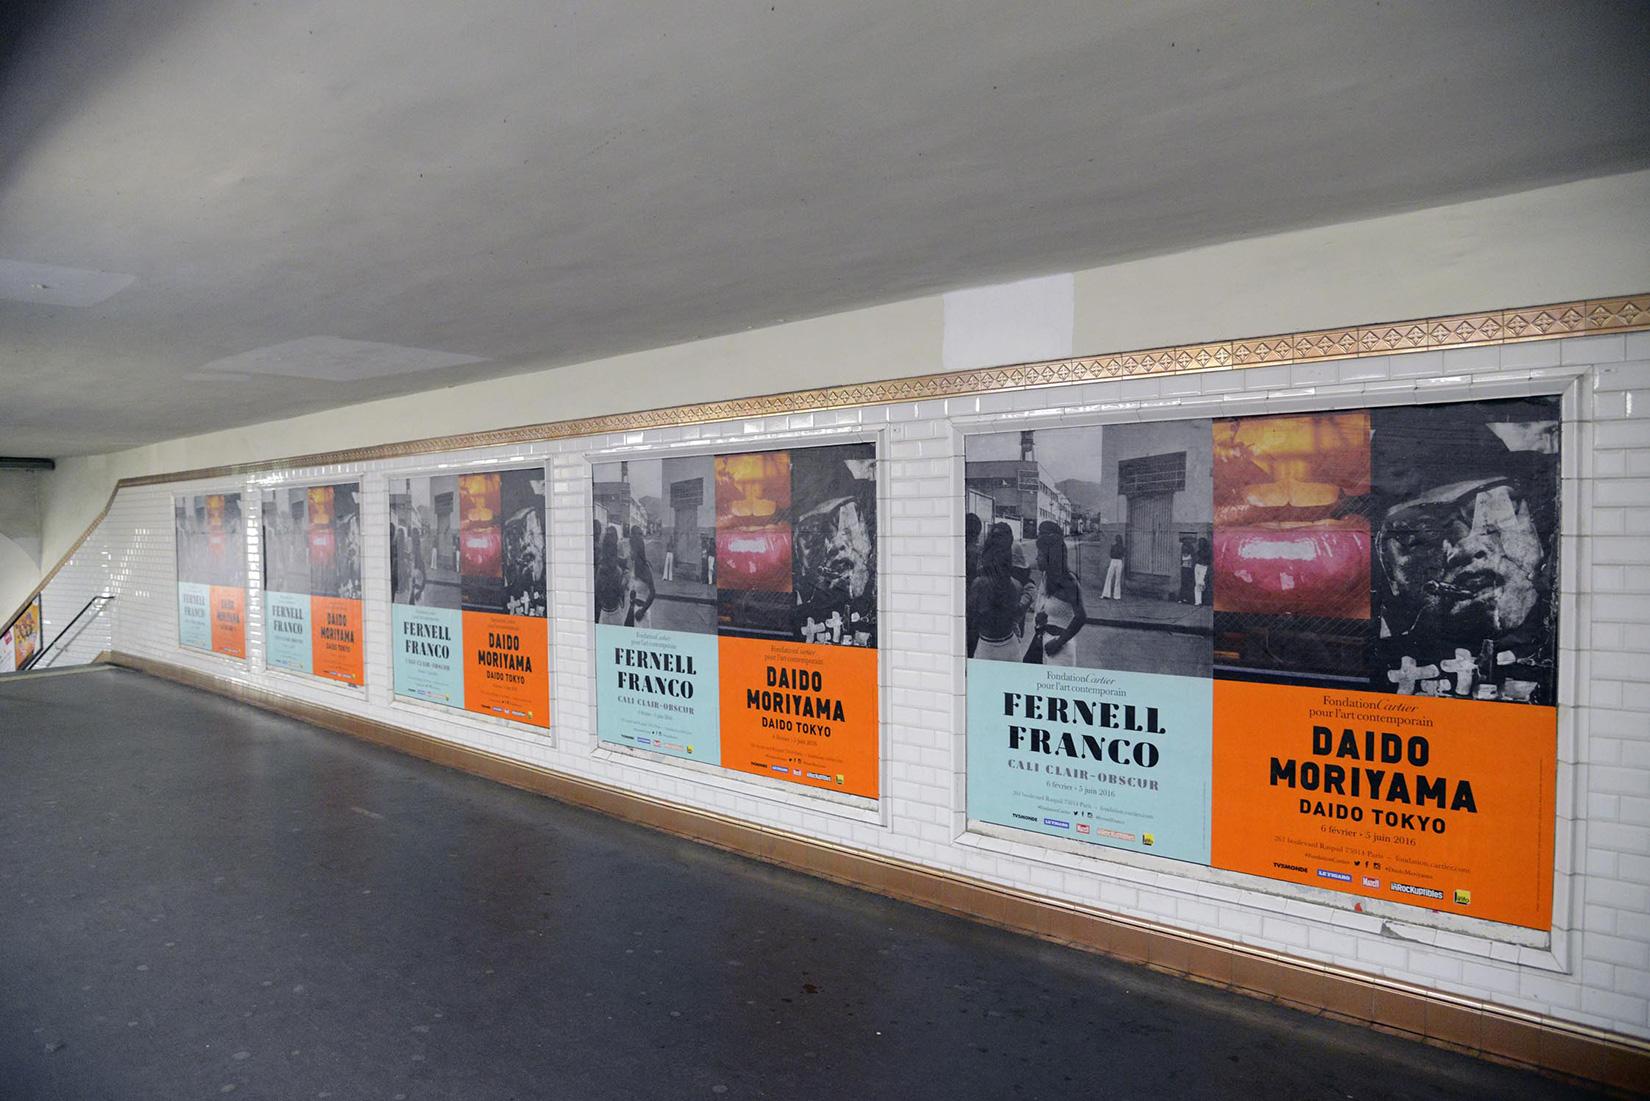 fondation-cartier-fernell-daido.jpg